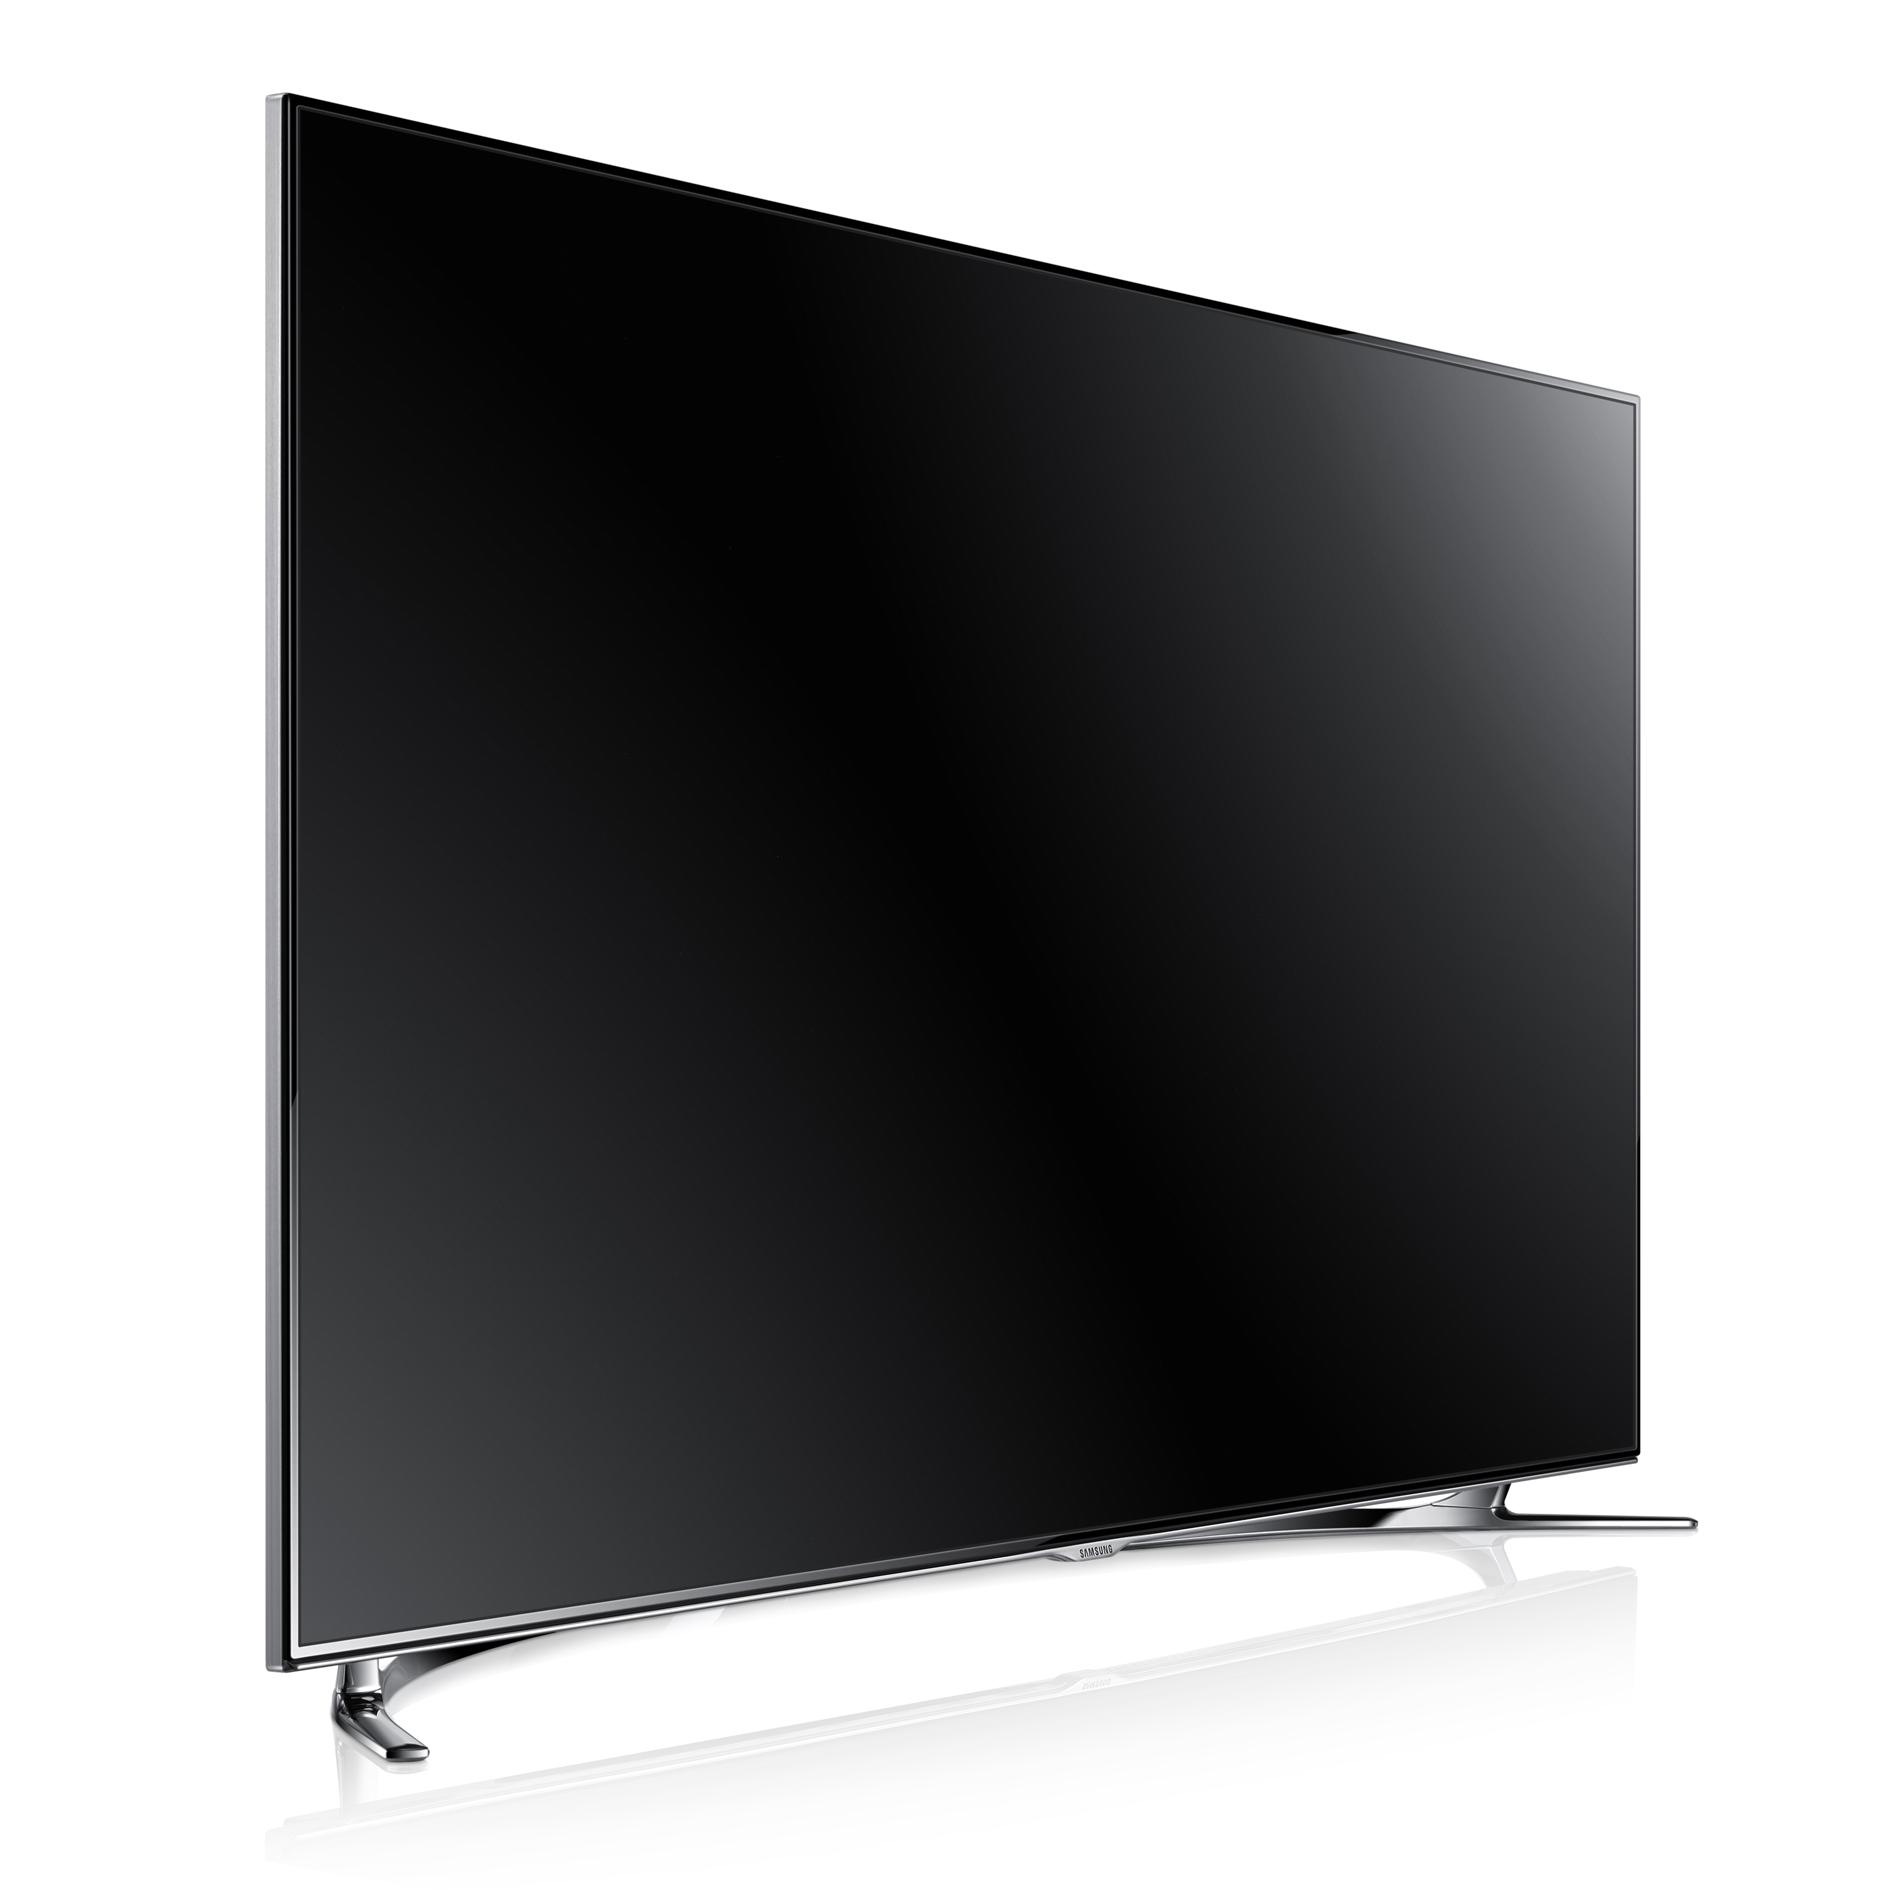 "Samsung 65"" Class 1080p 240Hz 3D LED HDTV - UN65F8000BFXZA"